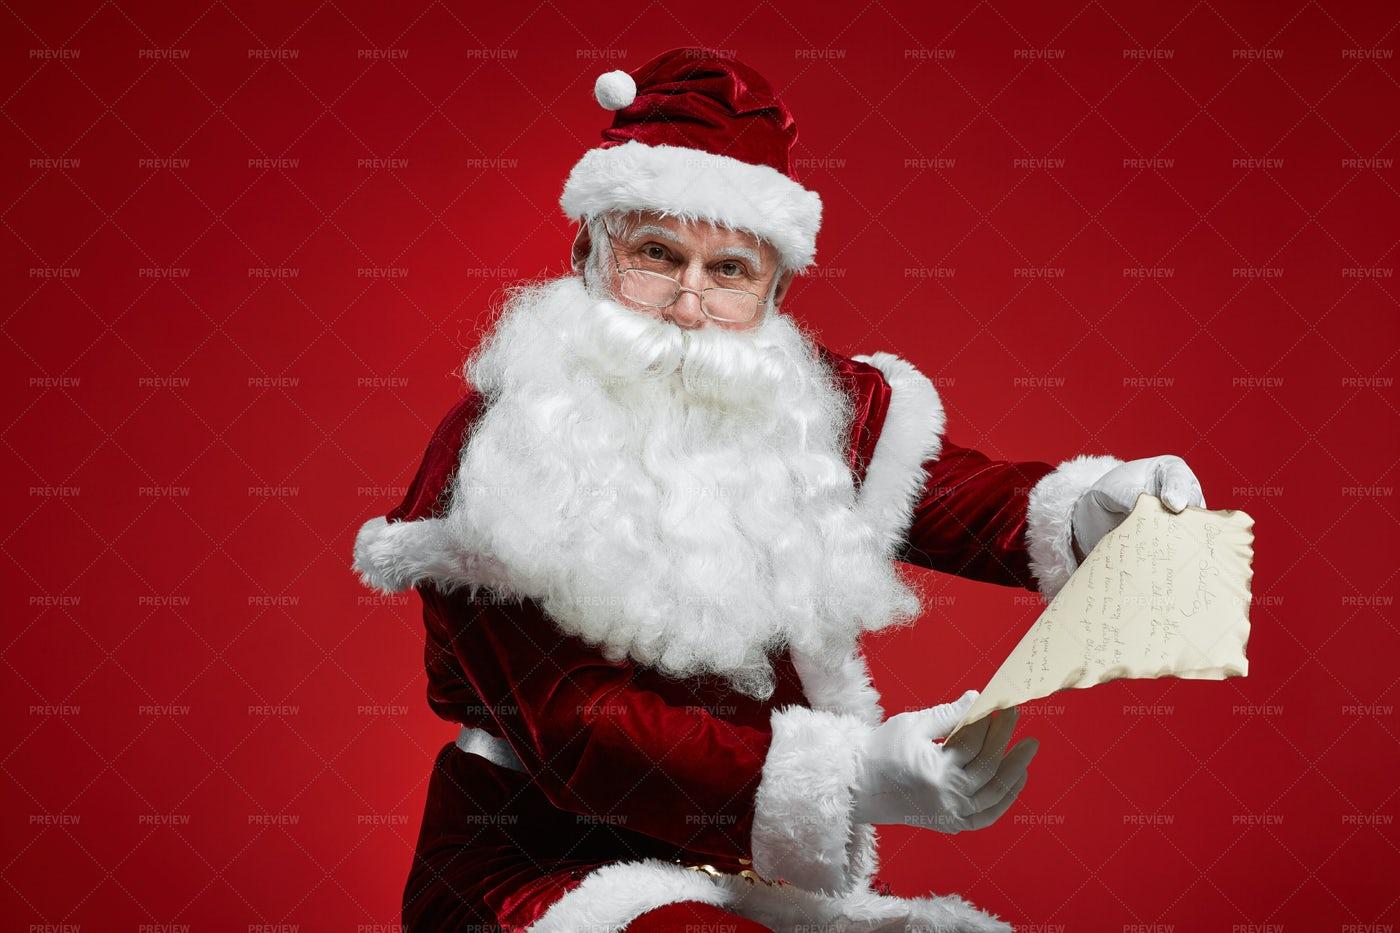 Christmas Letter From Children: Stock Photos